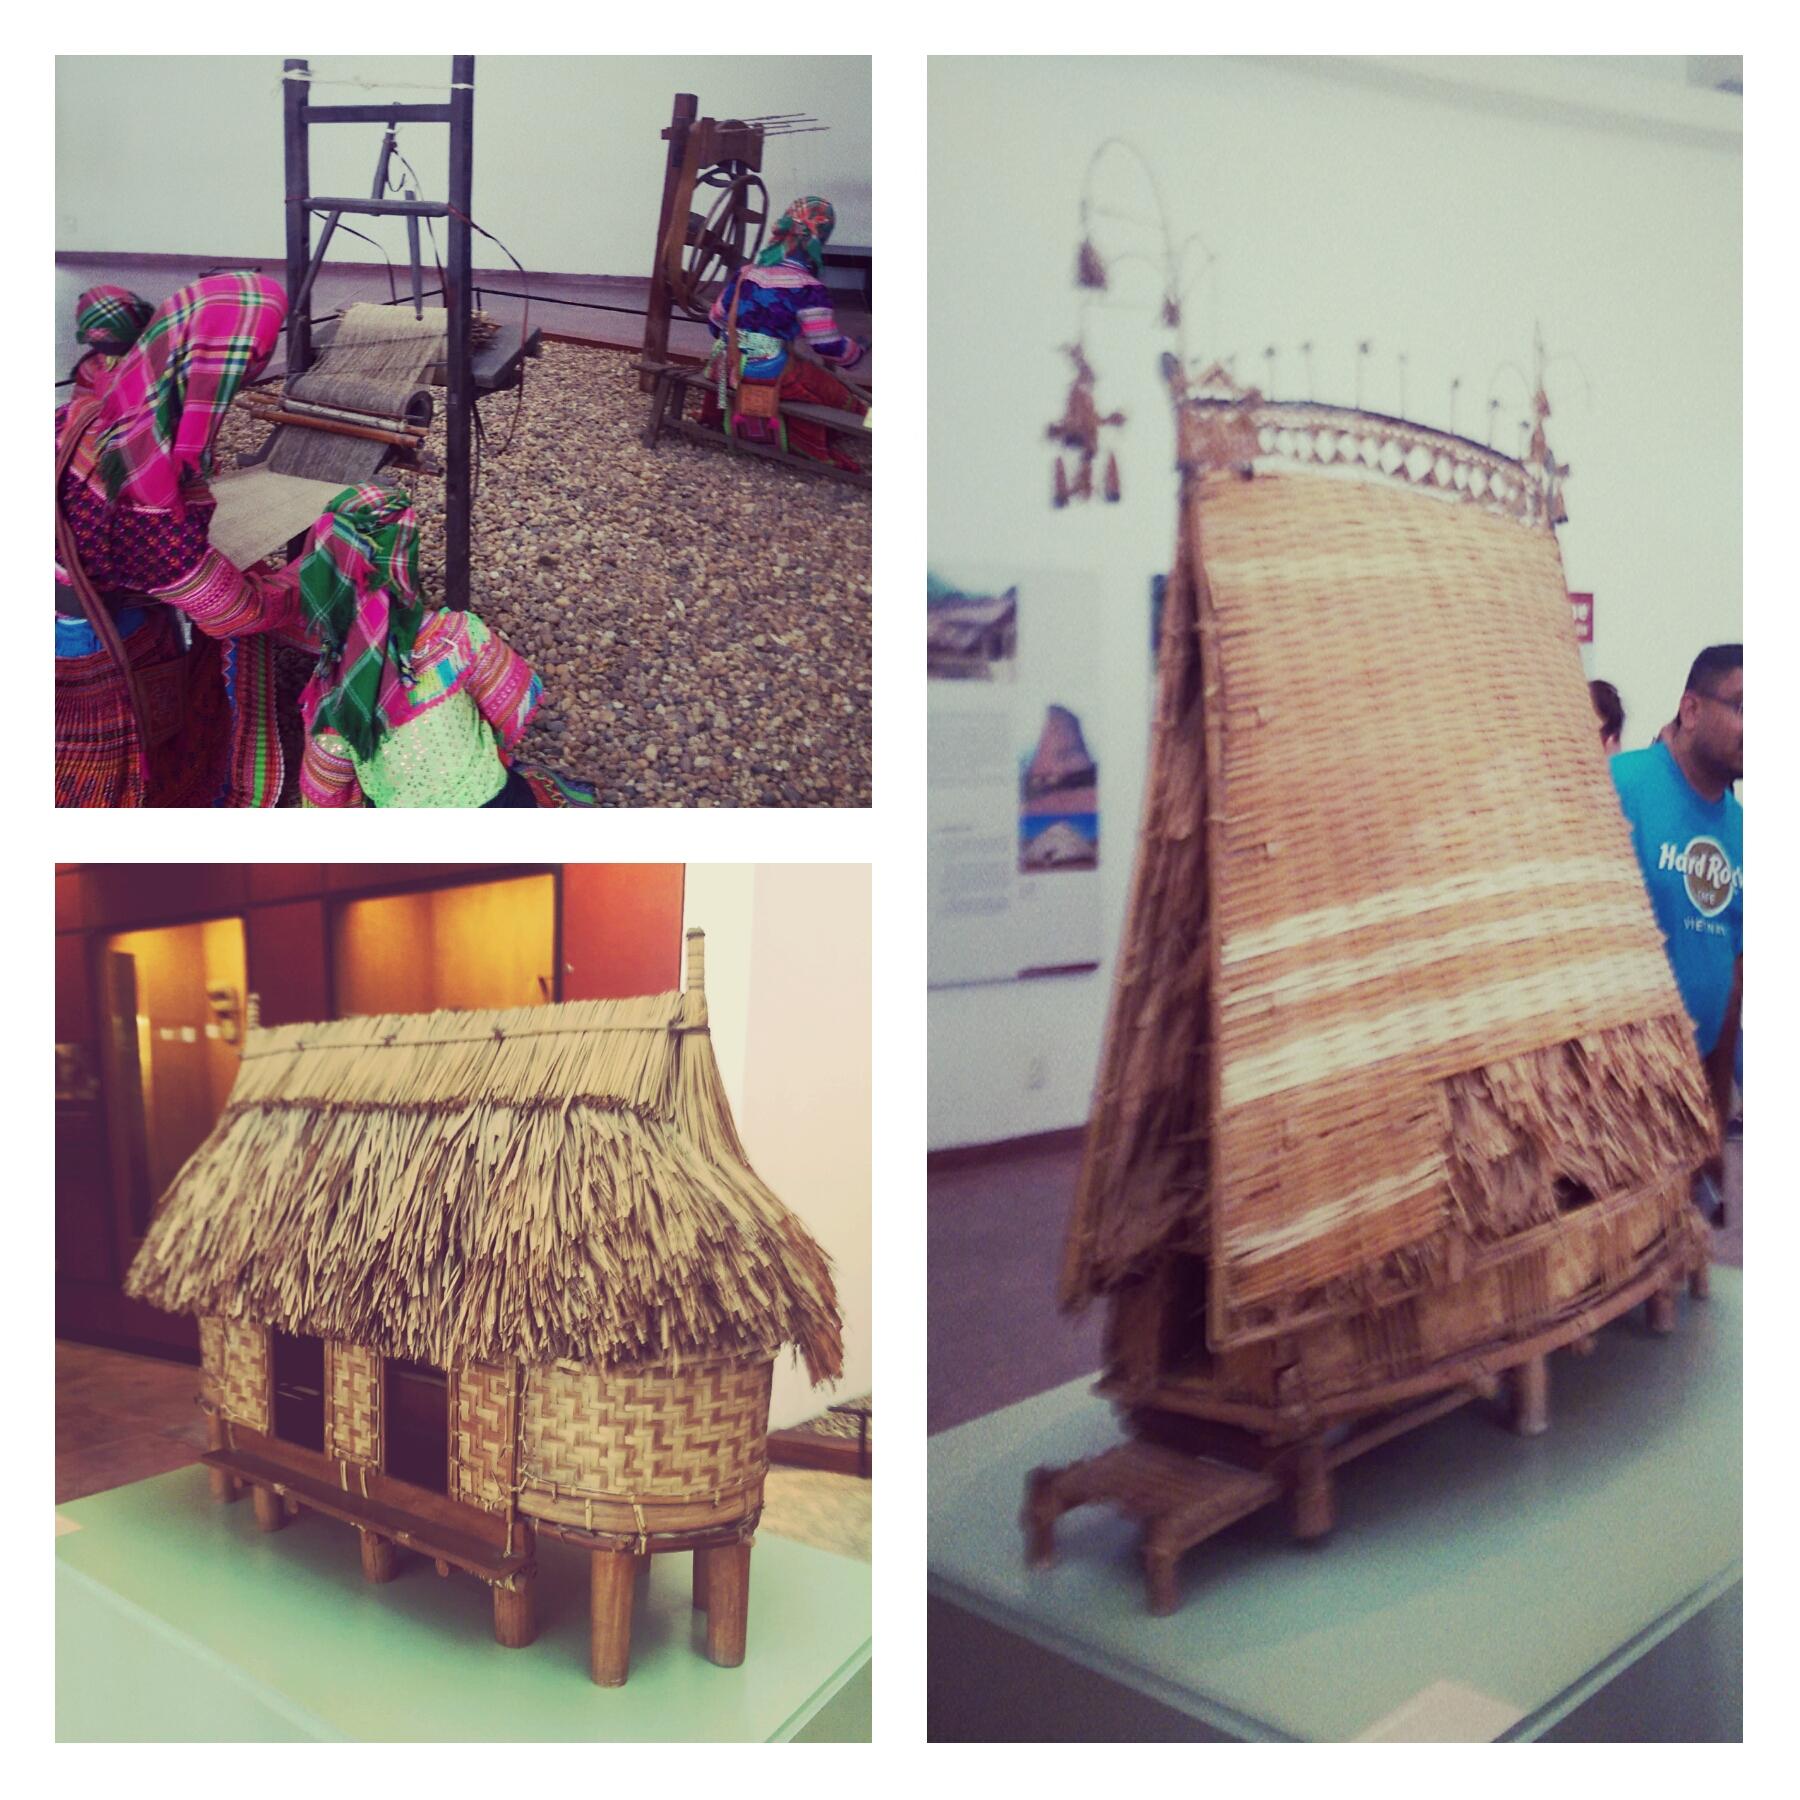 Vietnam Museum of Ethnology Vietnam Travel Blog